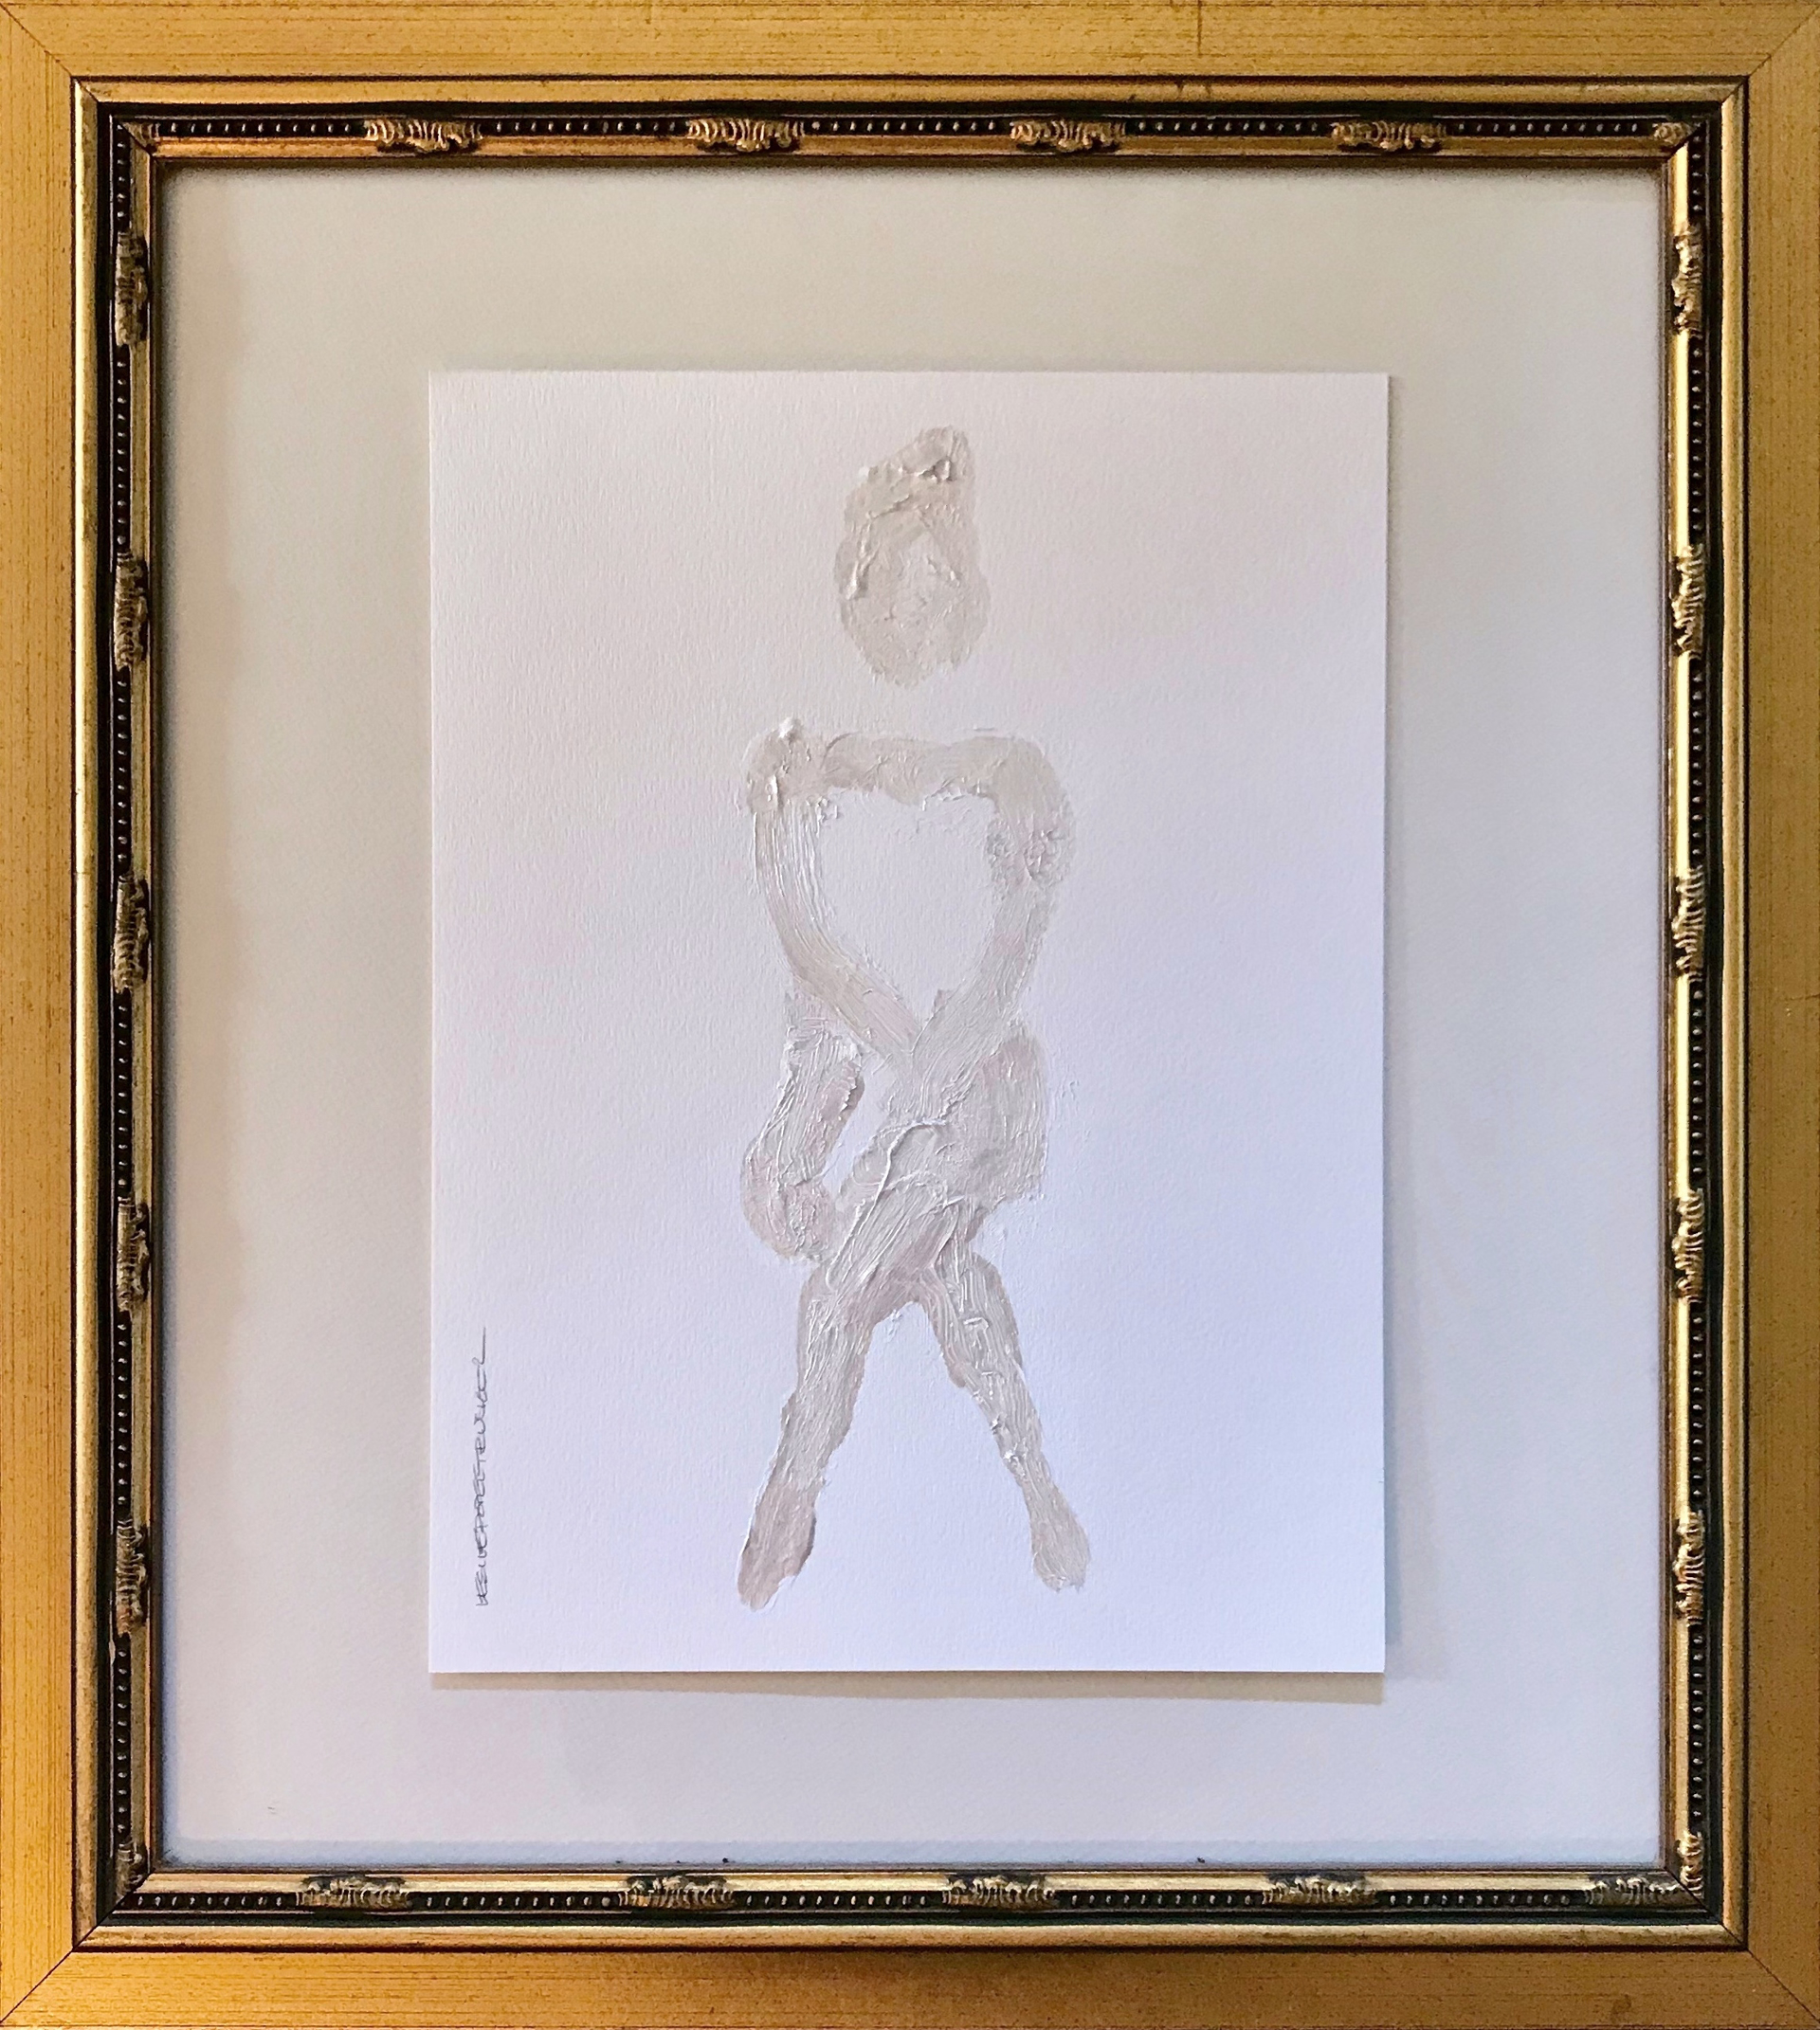 Figure No. 124 by Leslie Poteet Busker